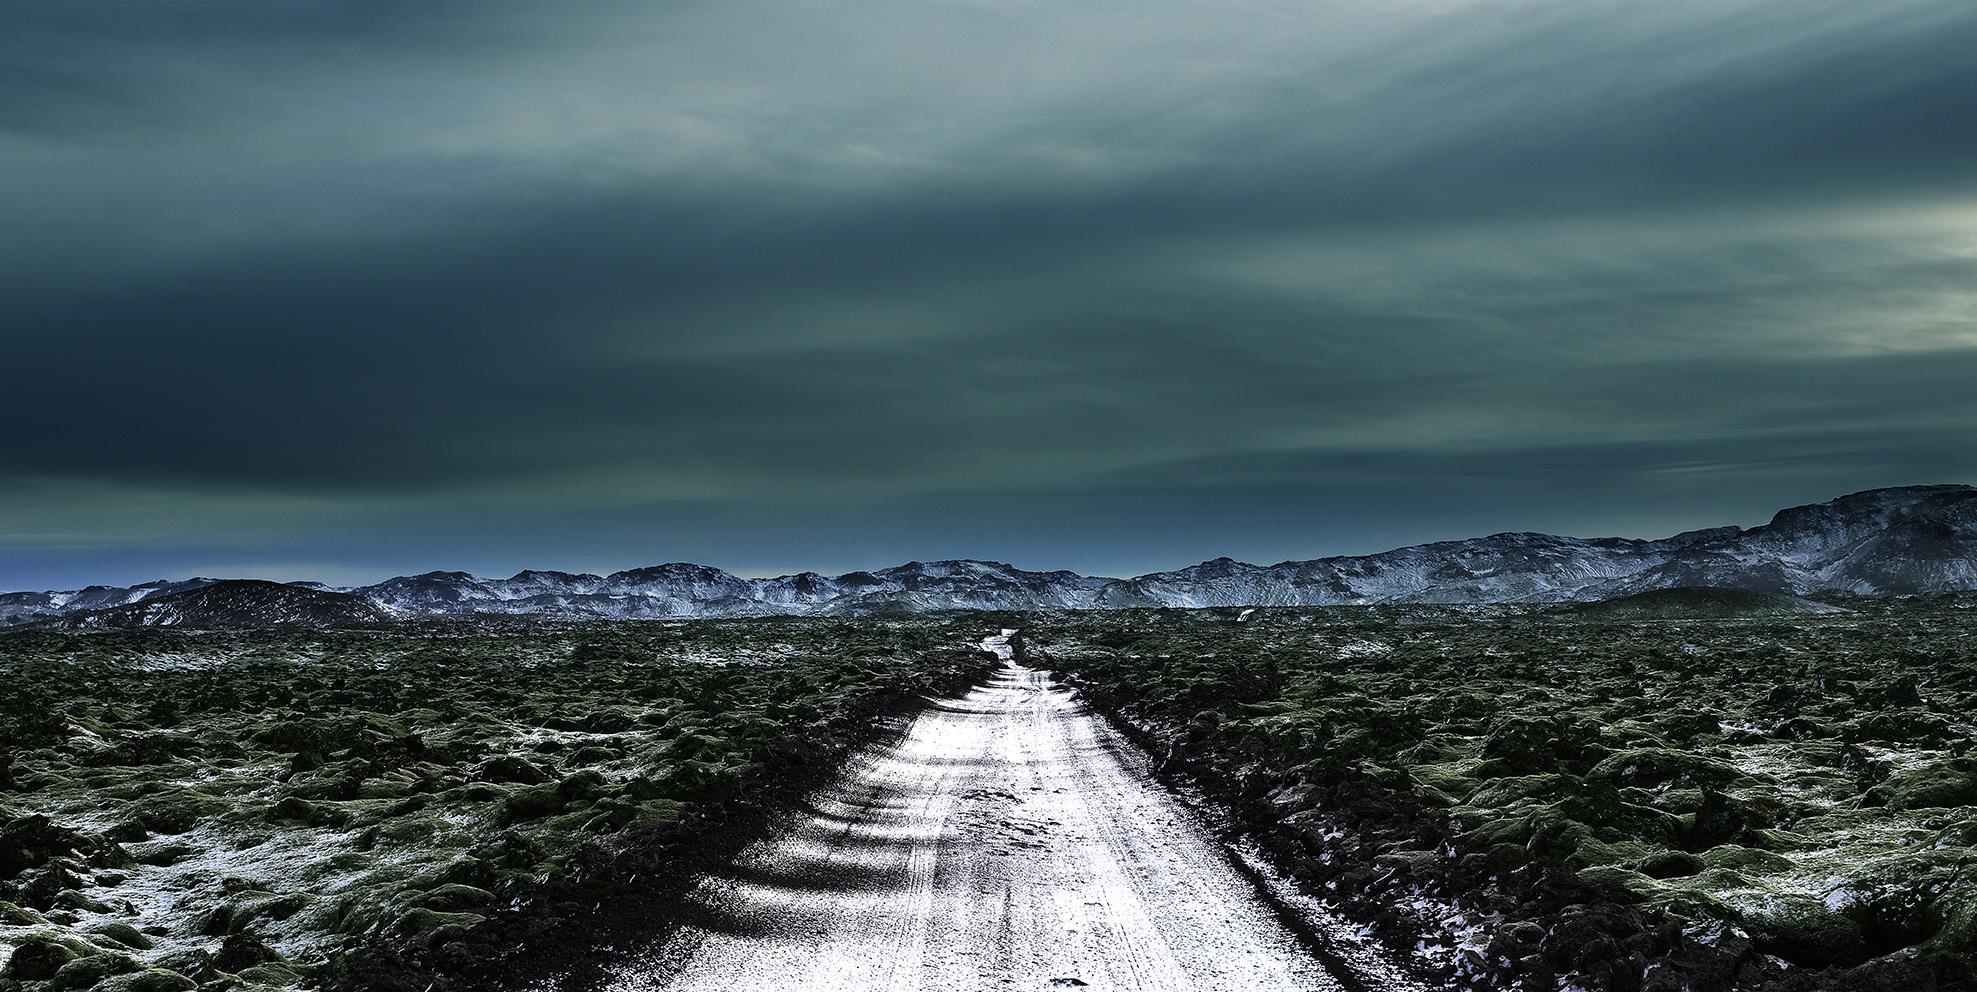 "Torfi Agnarsson, Gravel Road, 11"" x 14"""